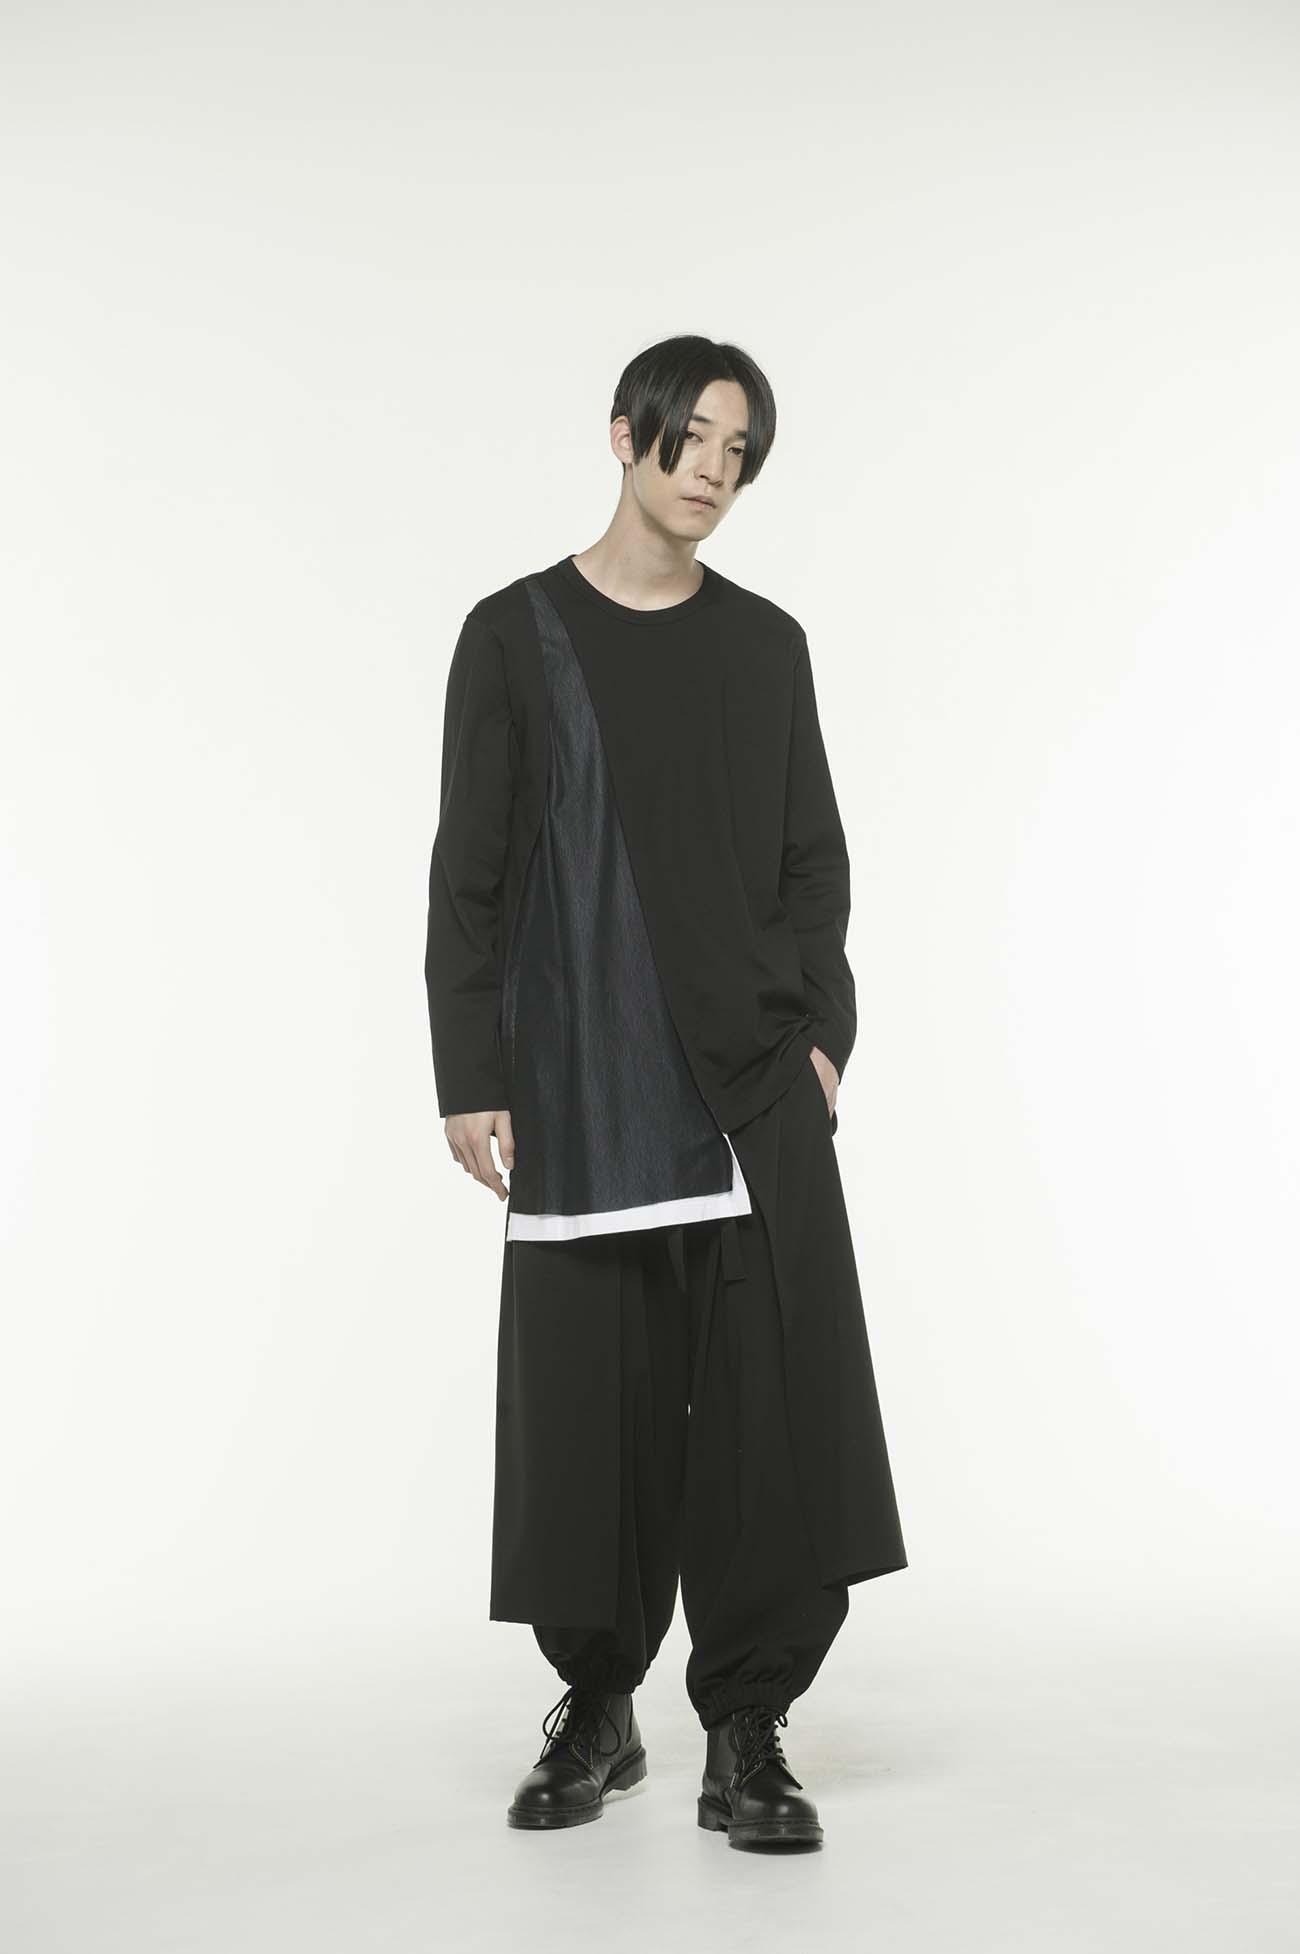 40/2 Cotton Jersey Tulle layered asymmetry drape T-shirt